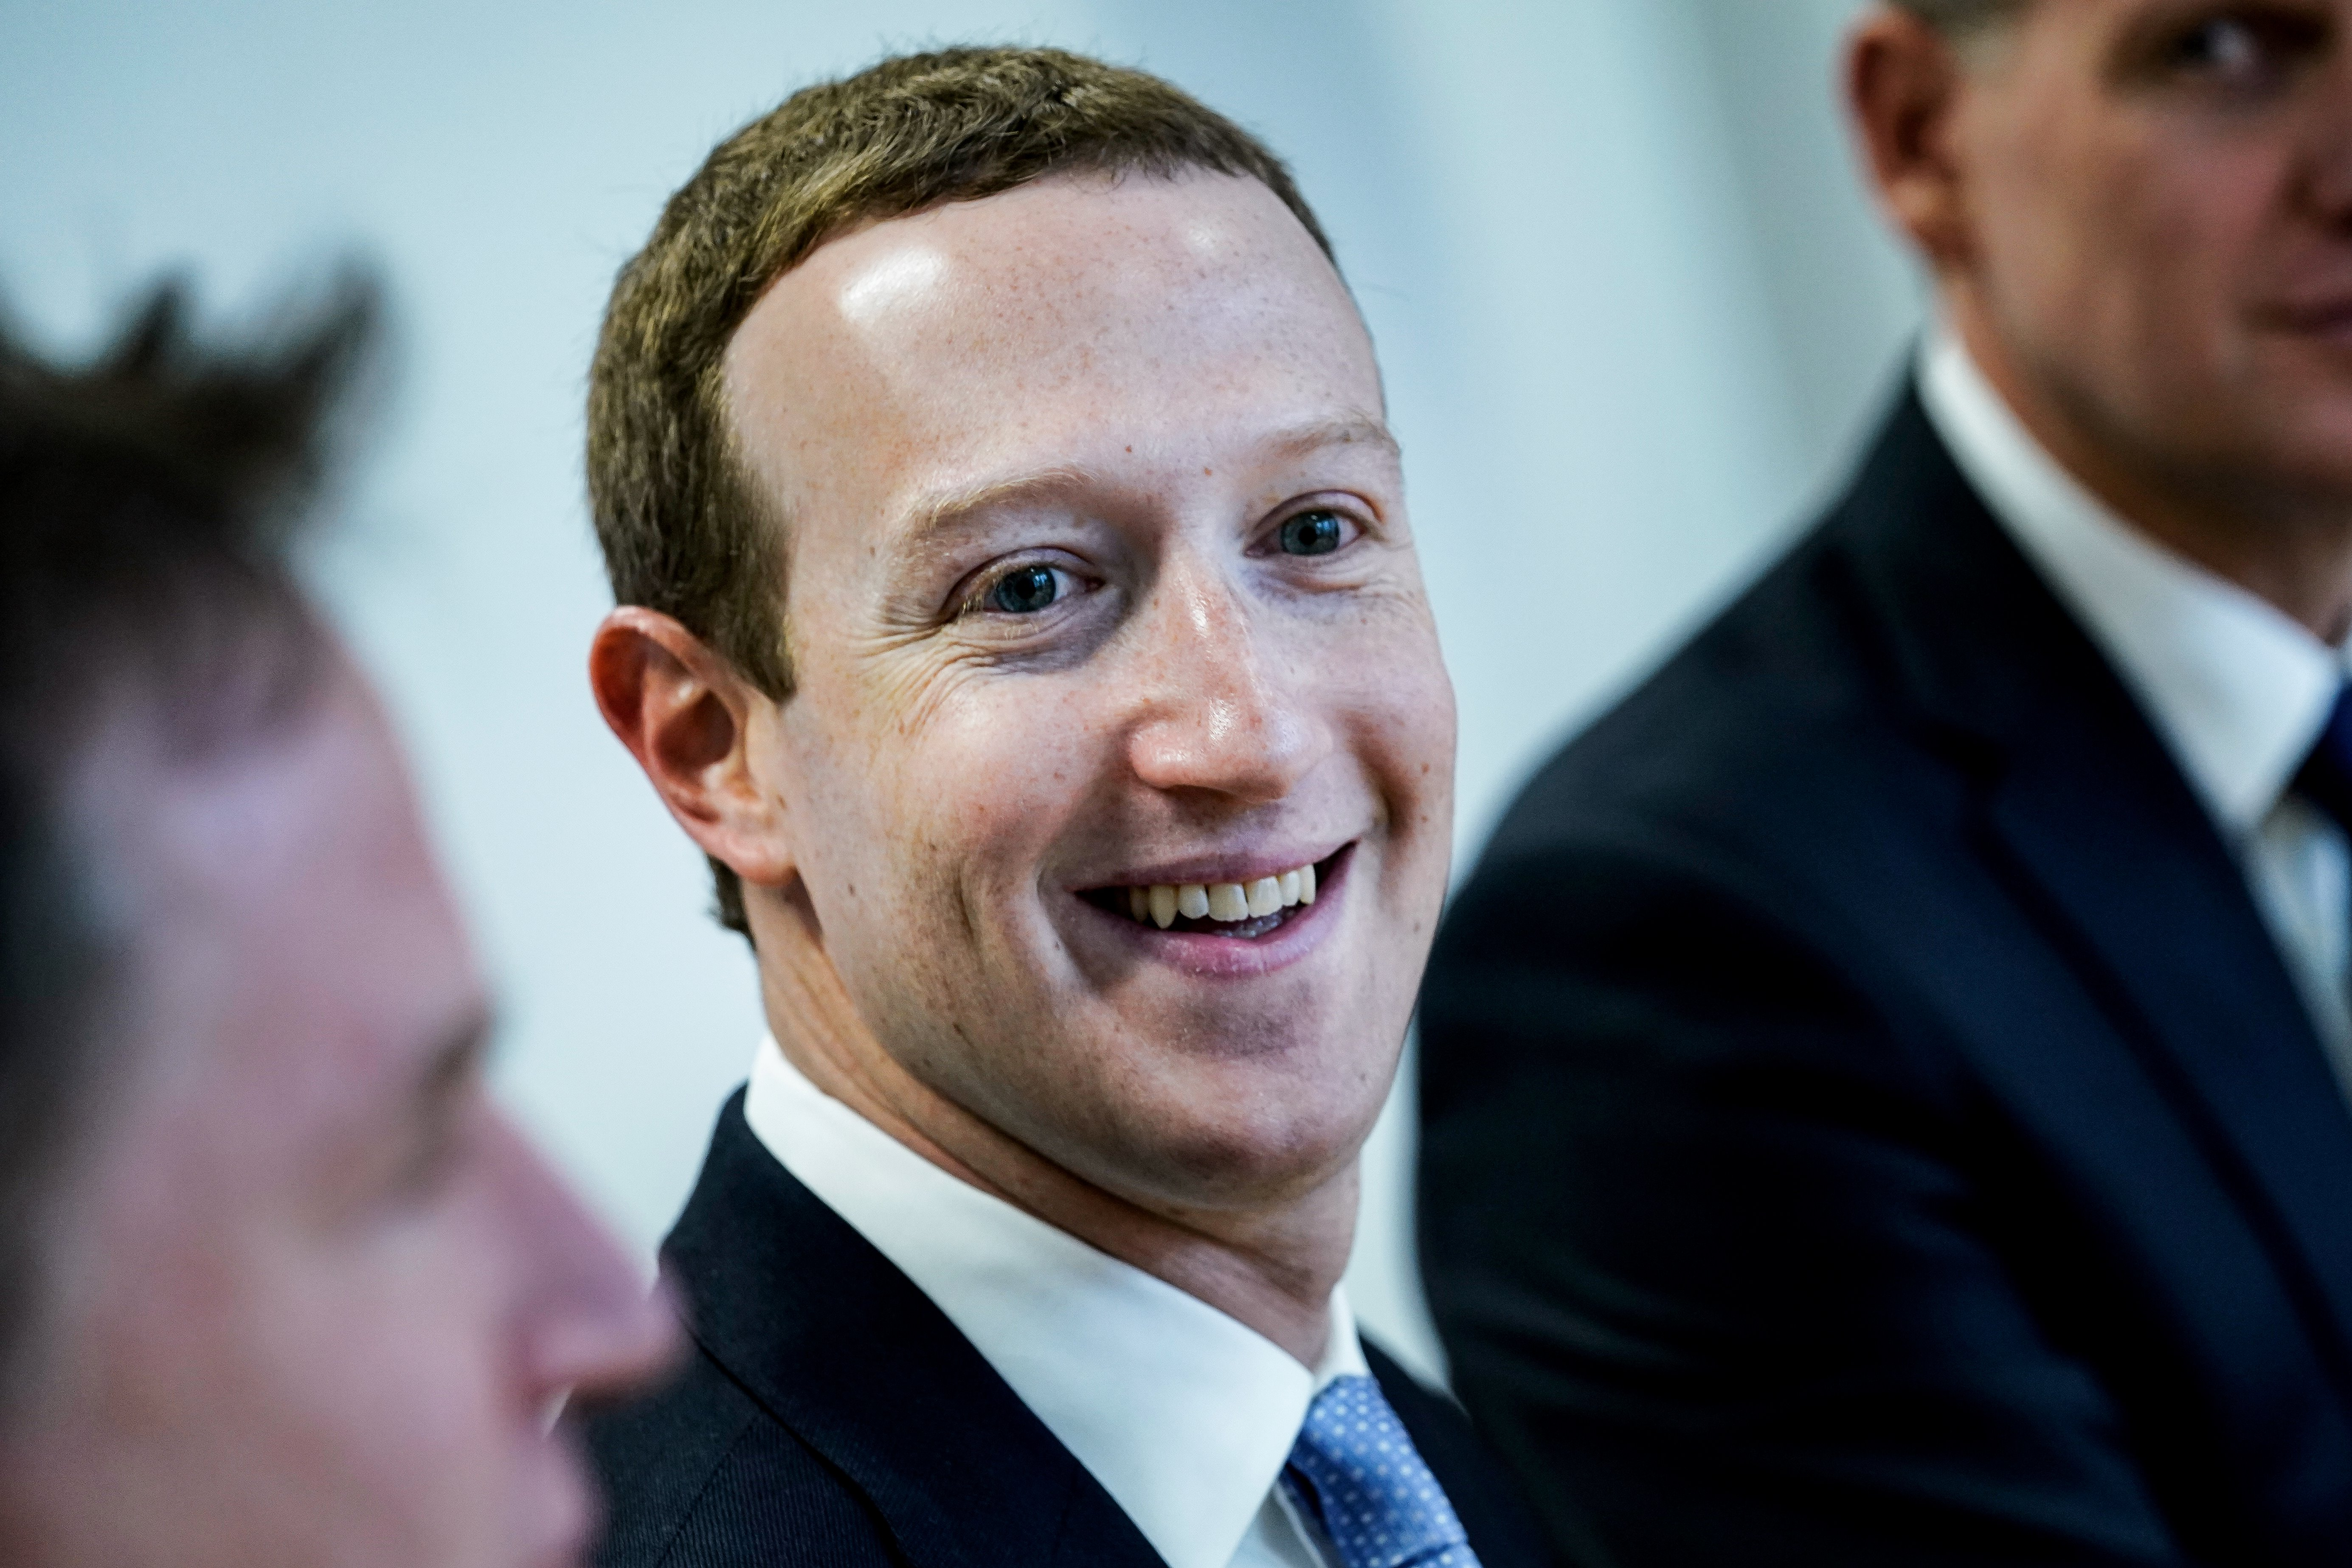 Mark Zuckerberg smiling.